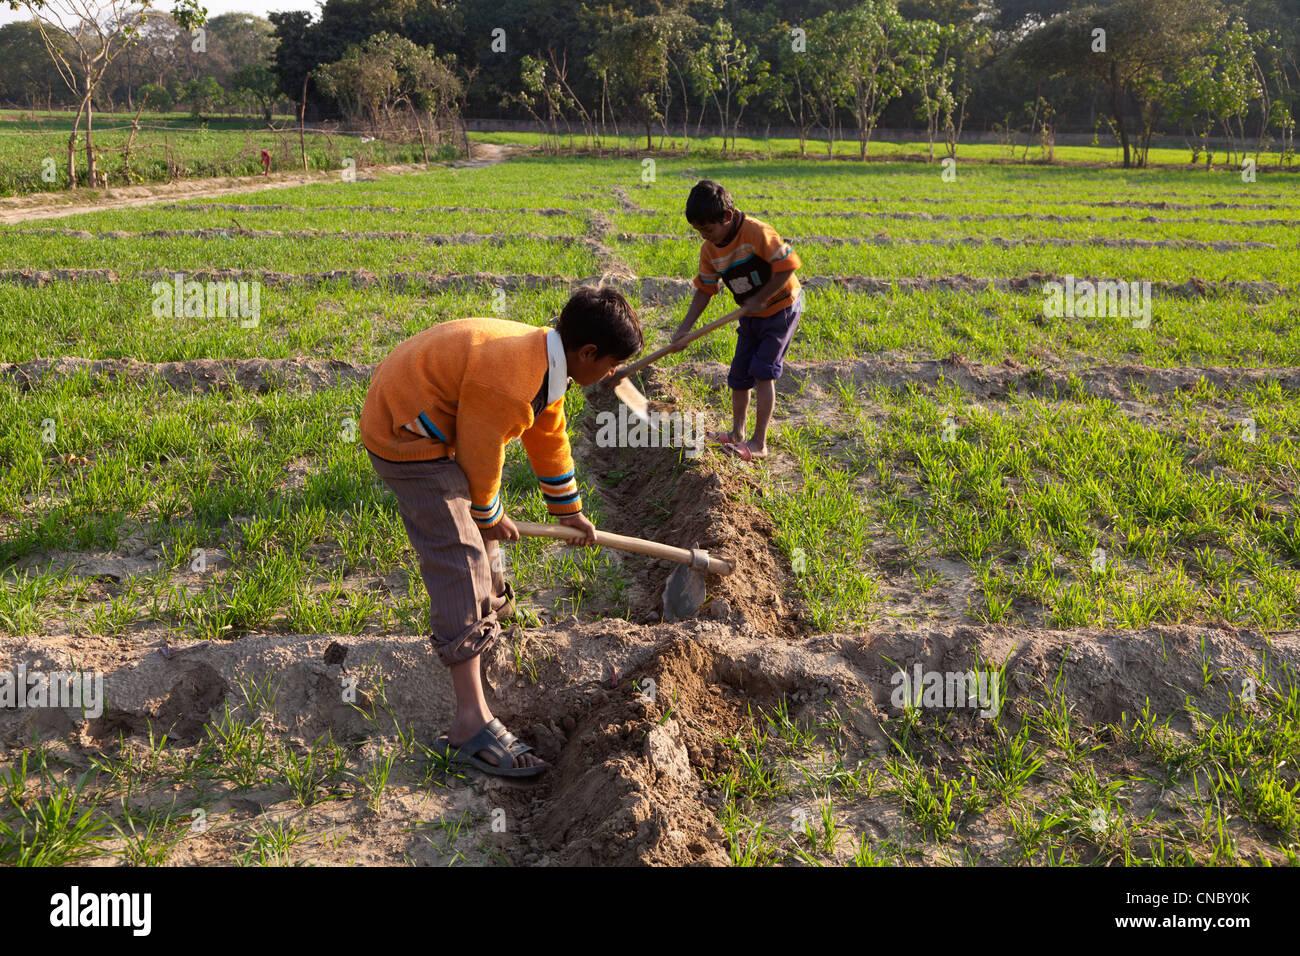 India, Uttar Pradesh, Agra, young boys working in field - Stock Image